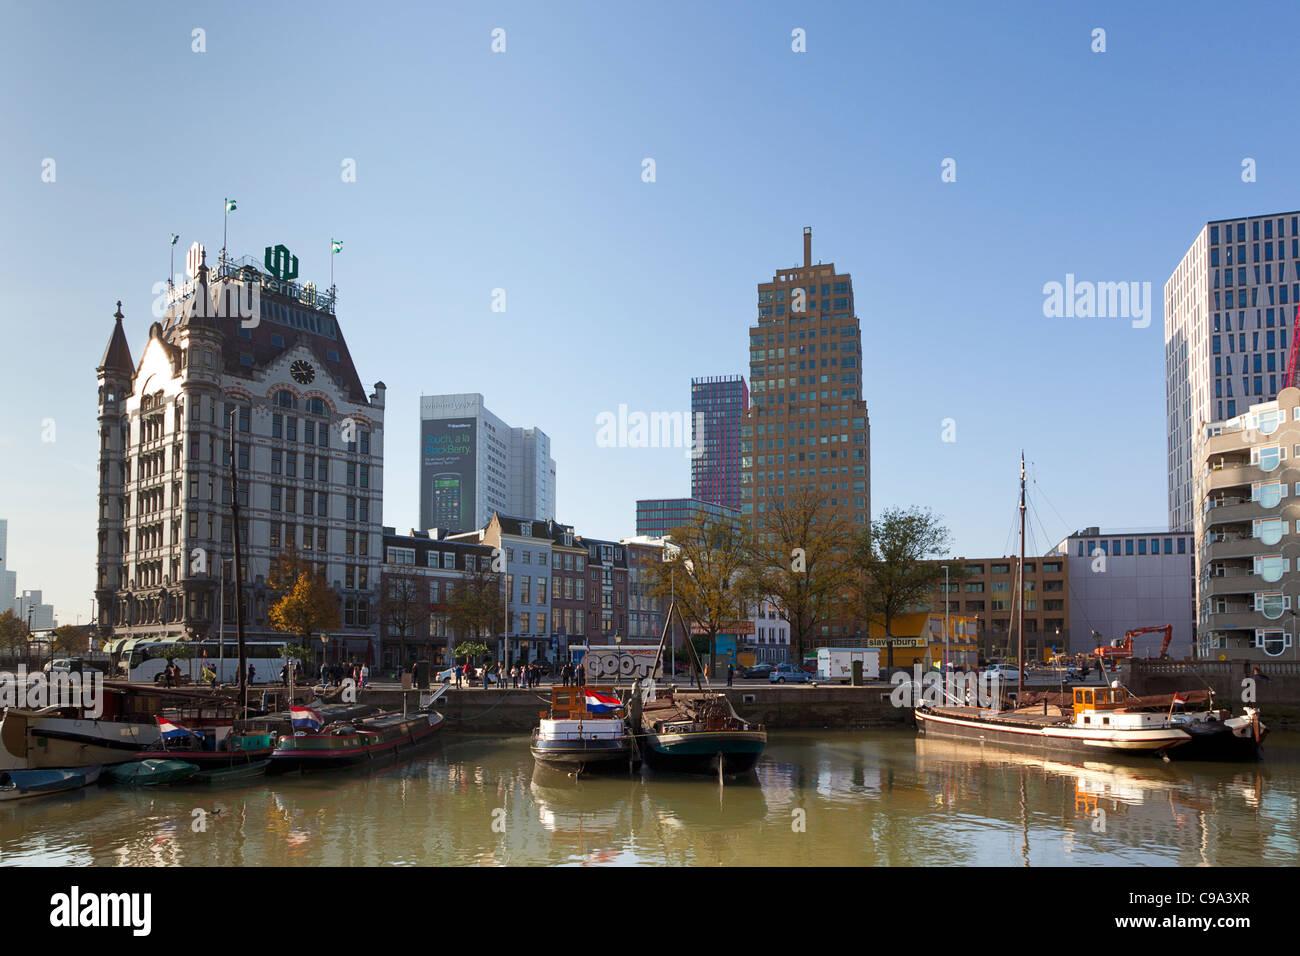 Antiguo puerto interior en Rotterdam Imagen De Stock